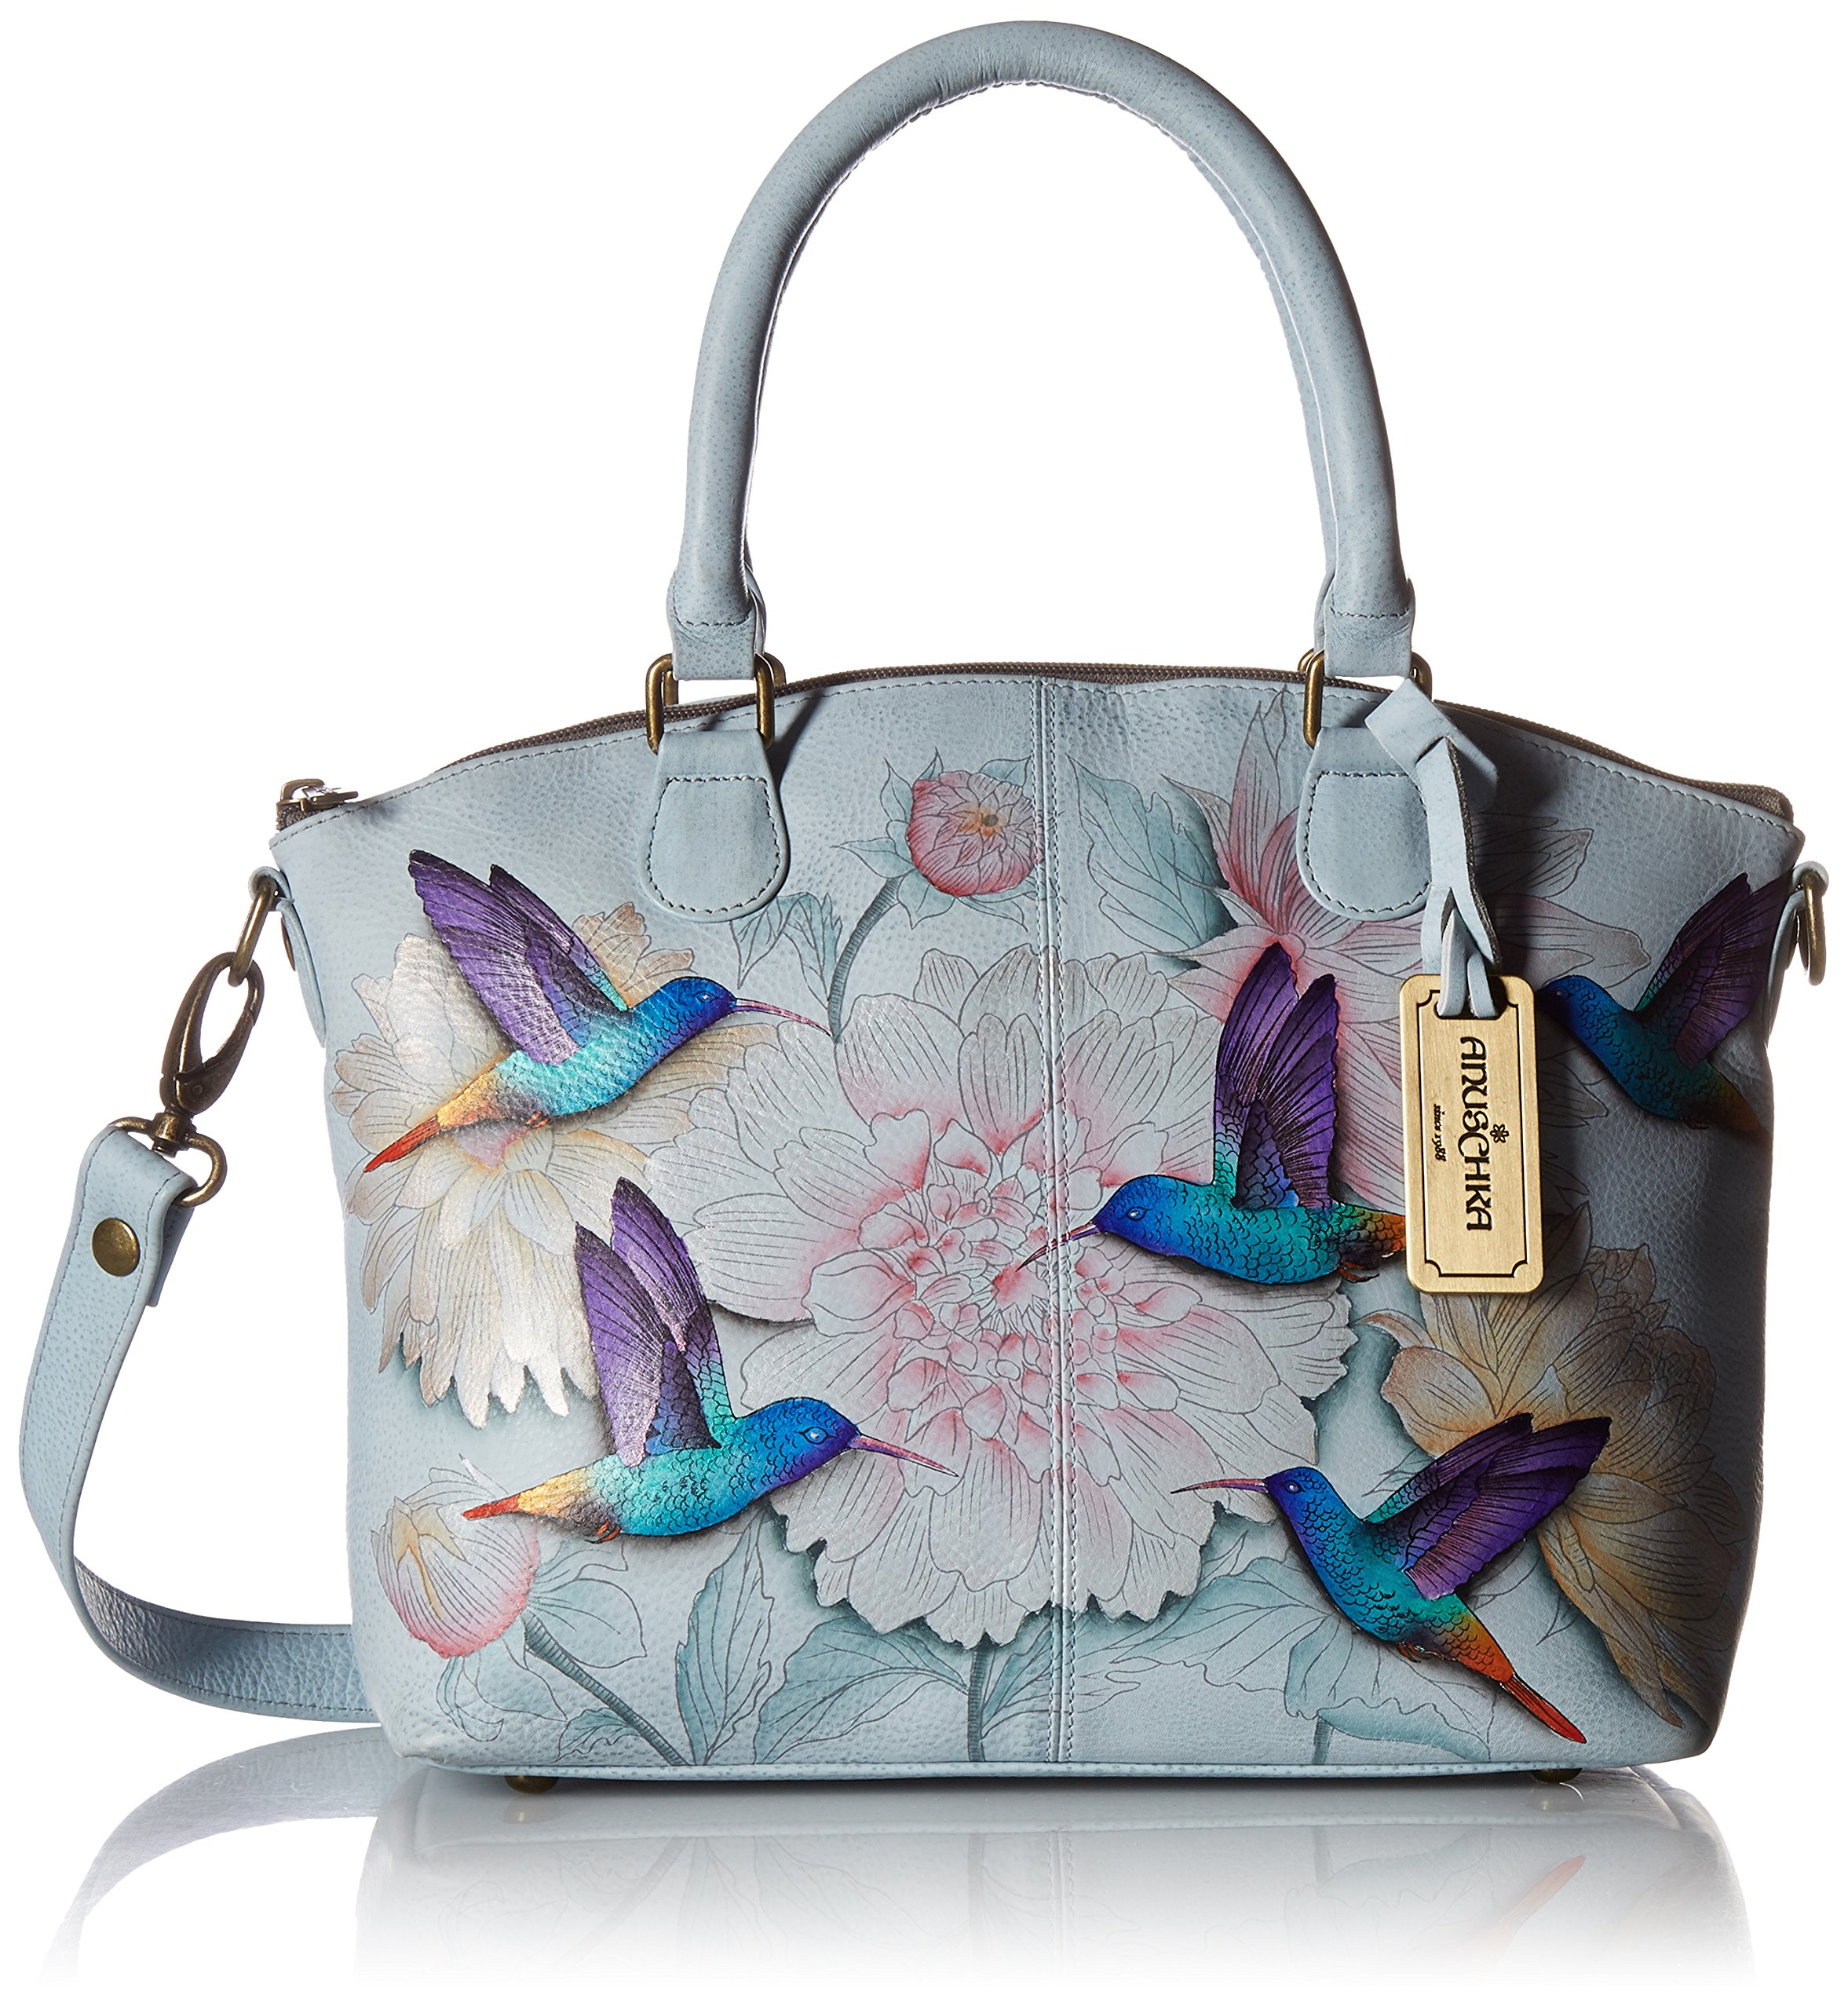 Anuschka Women's Medium Satchel Leather Hand Painted Shoulder Bag, Rainbow Birds